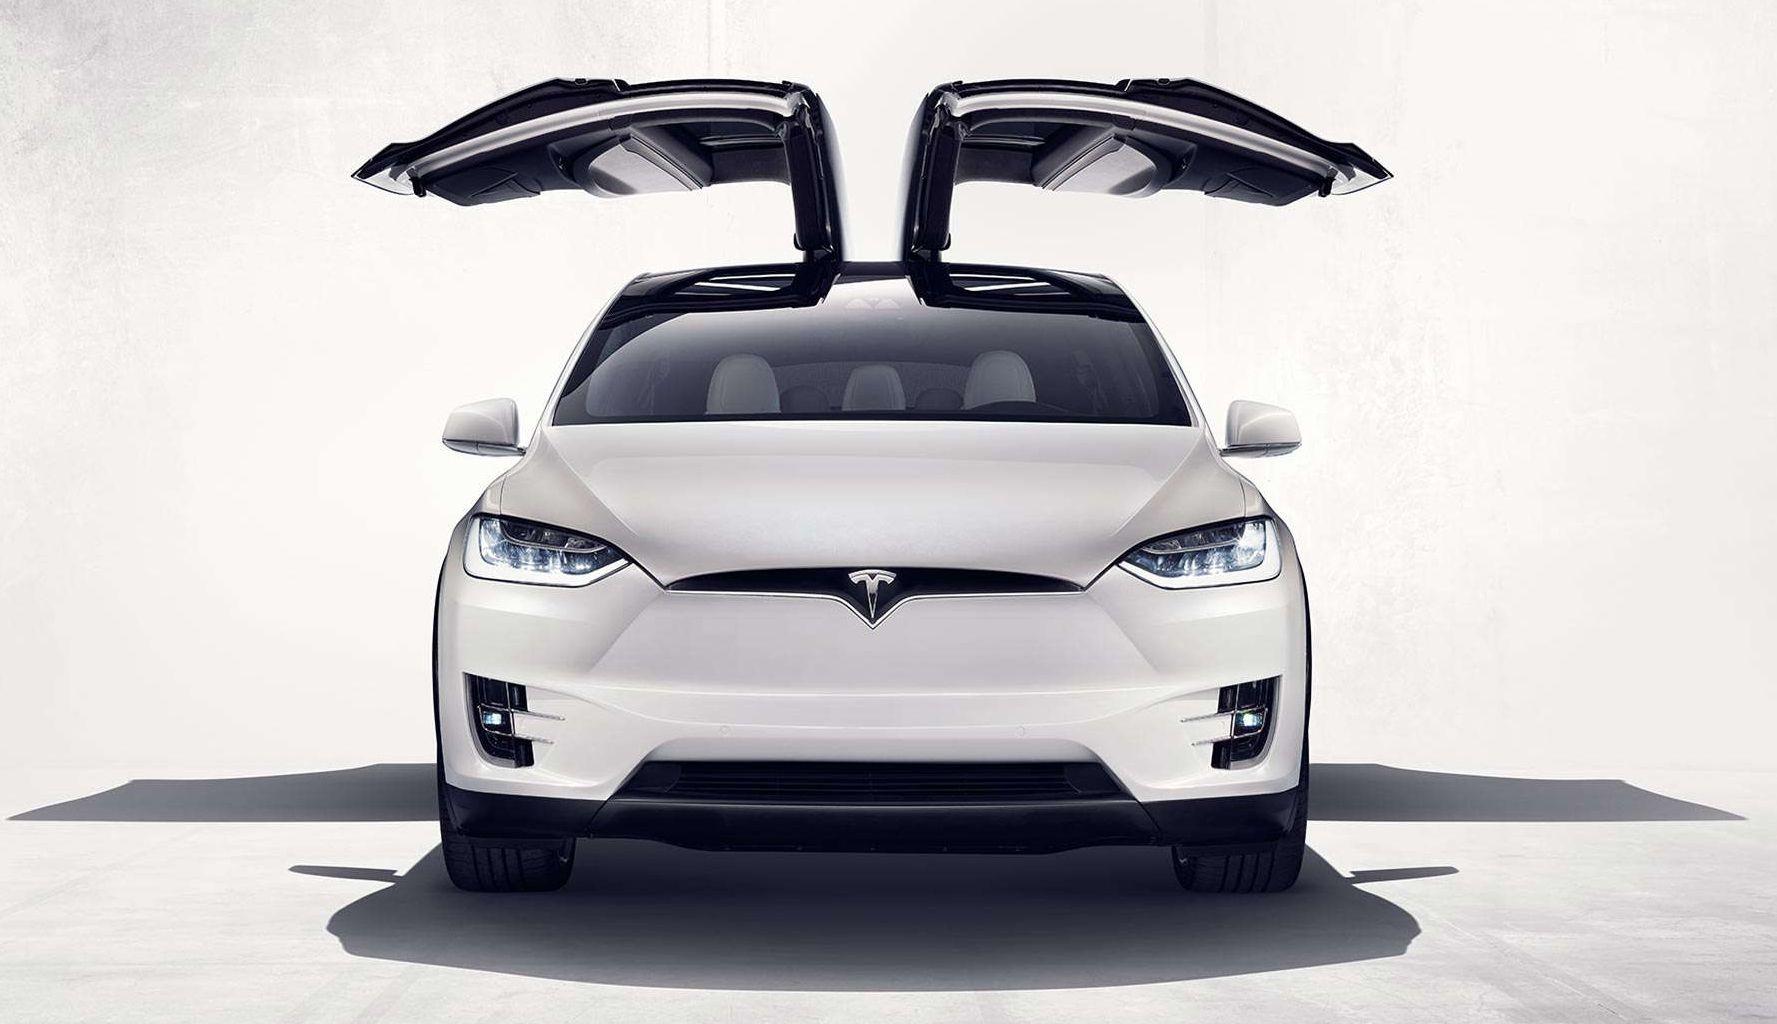 Electric Suv Showdown Tesla Vs Audi Tesla Model X Tesla Model S Tesla Model